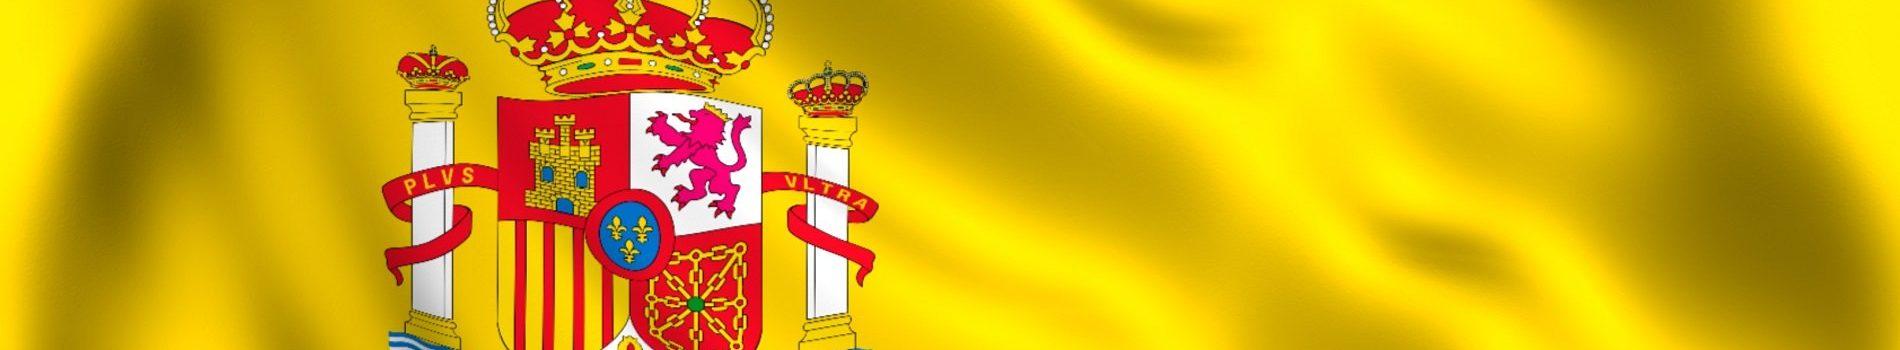 Classifica Musica spagnola – Aprile 2021